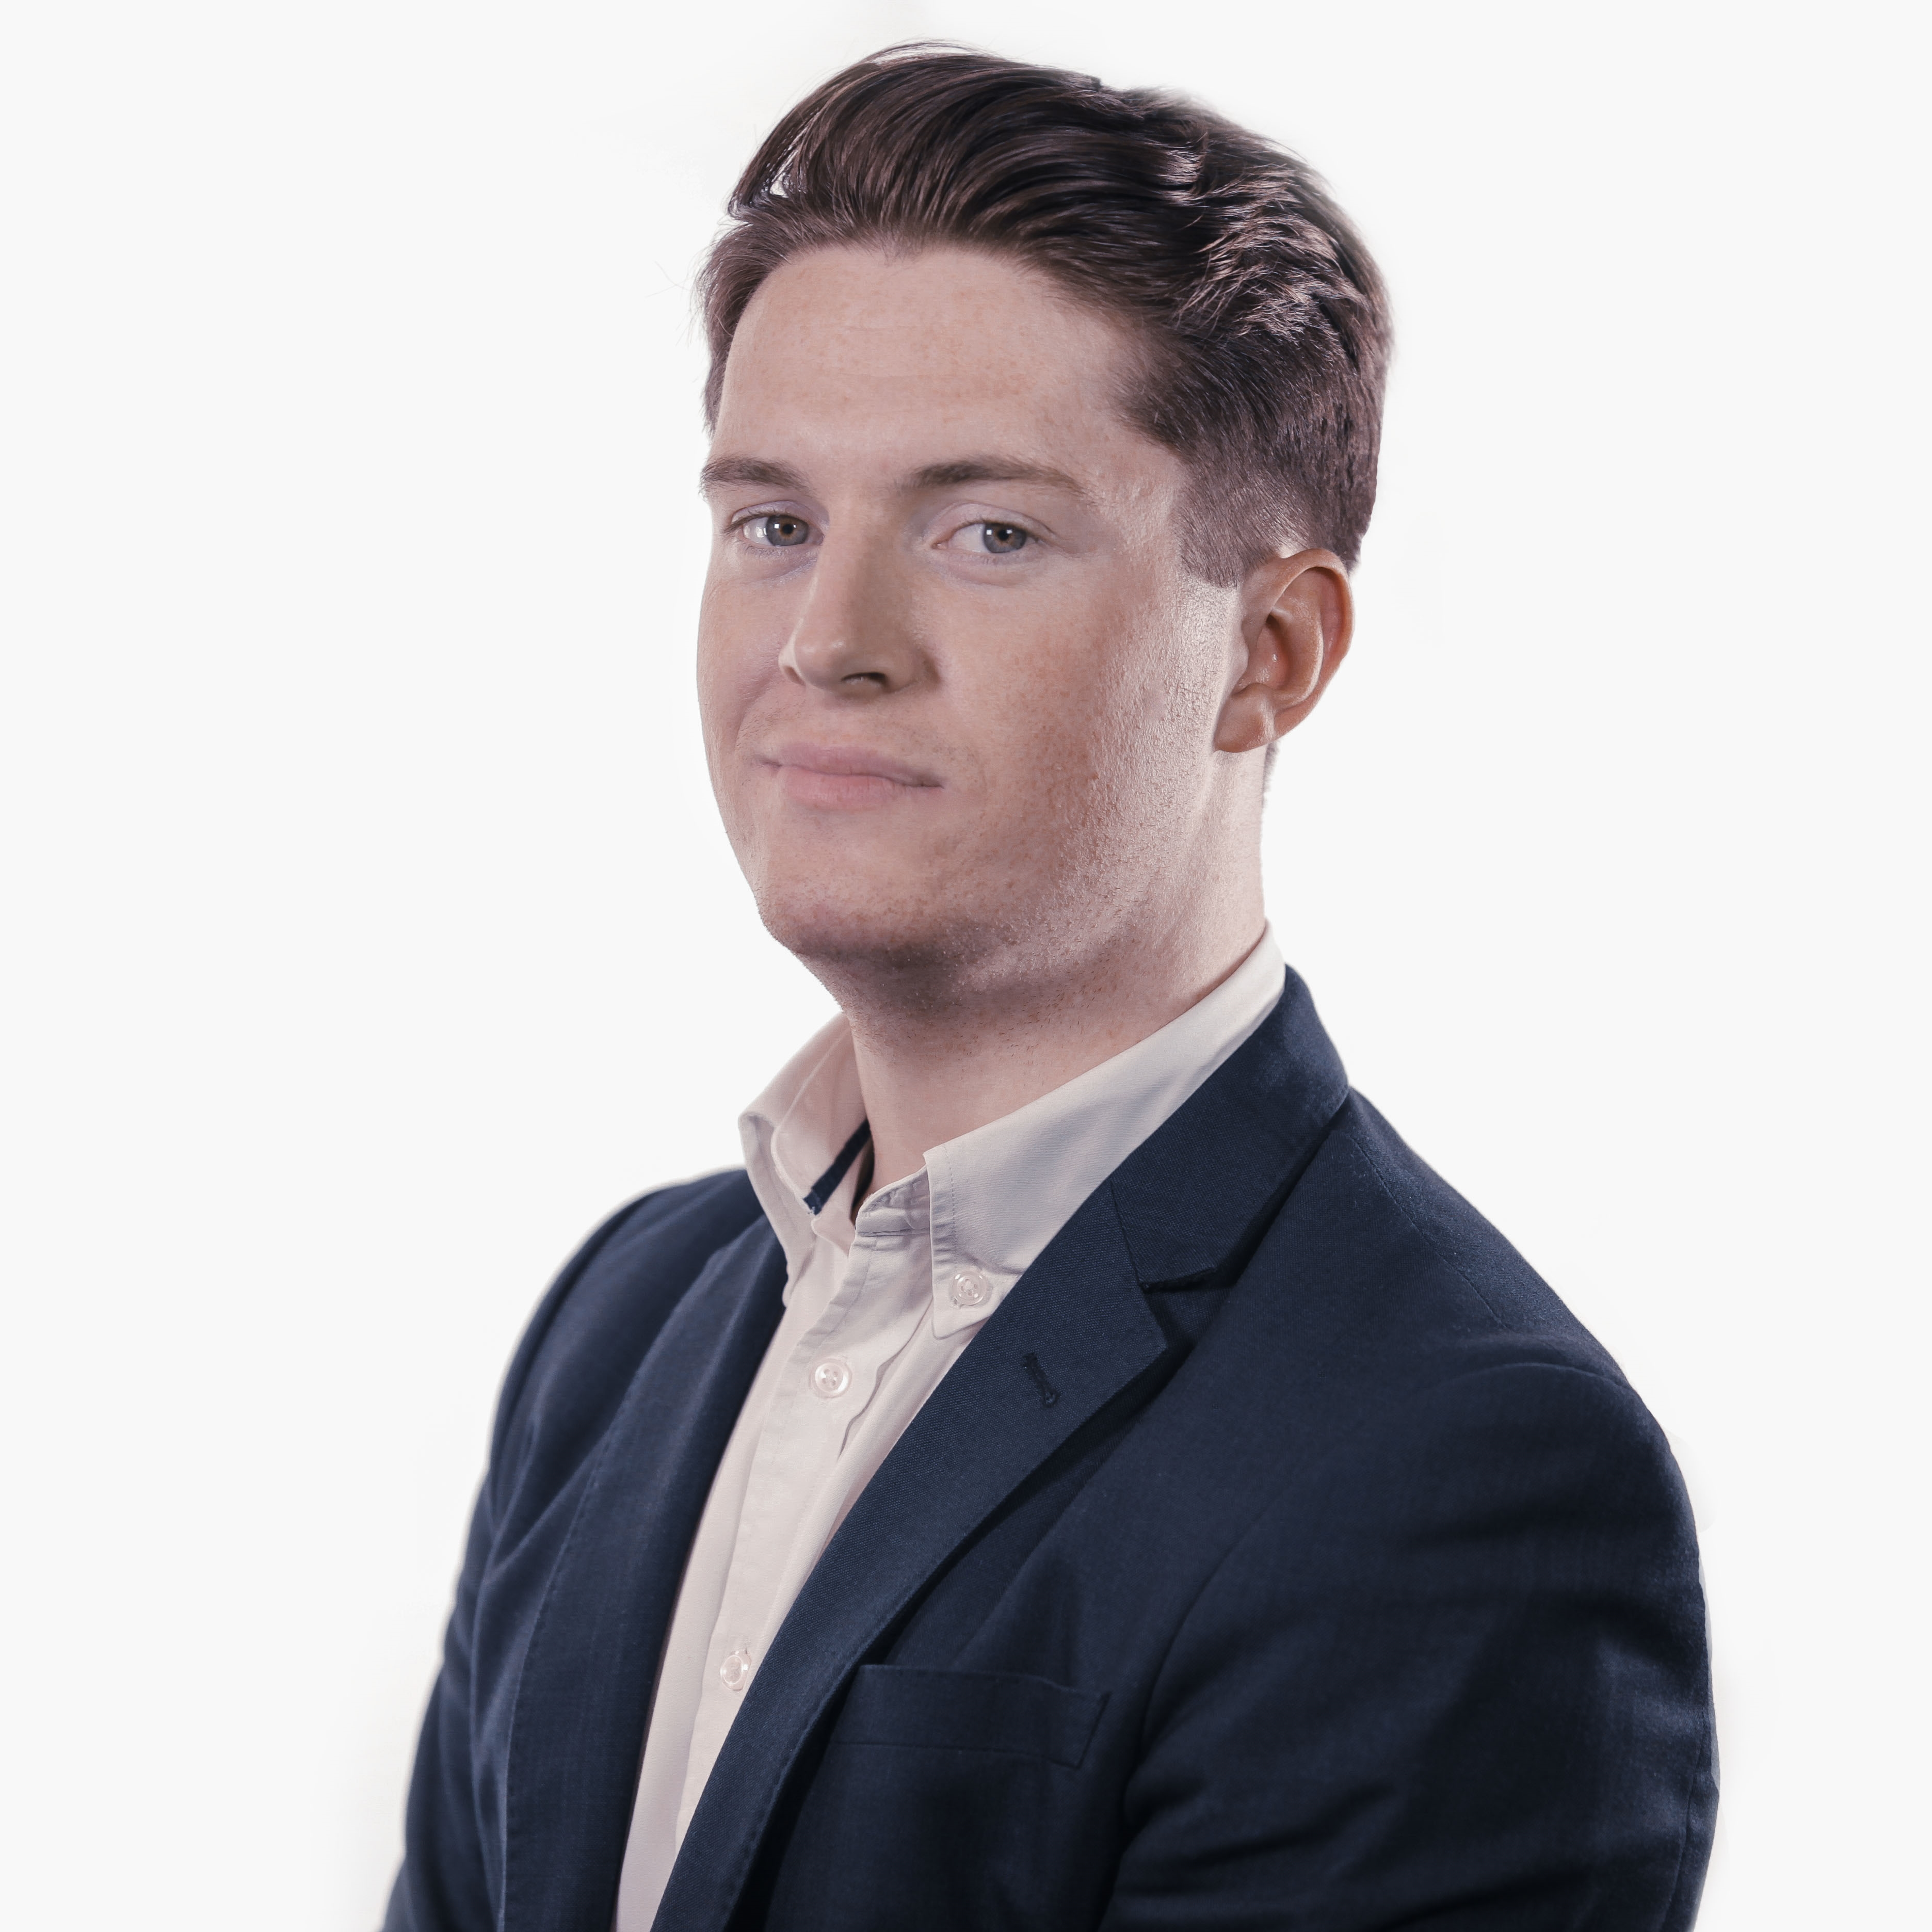 Andrew Morris Portrait